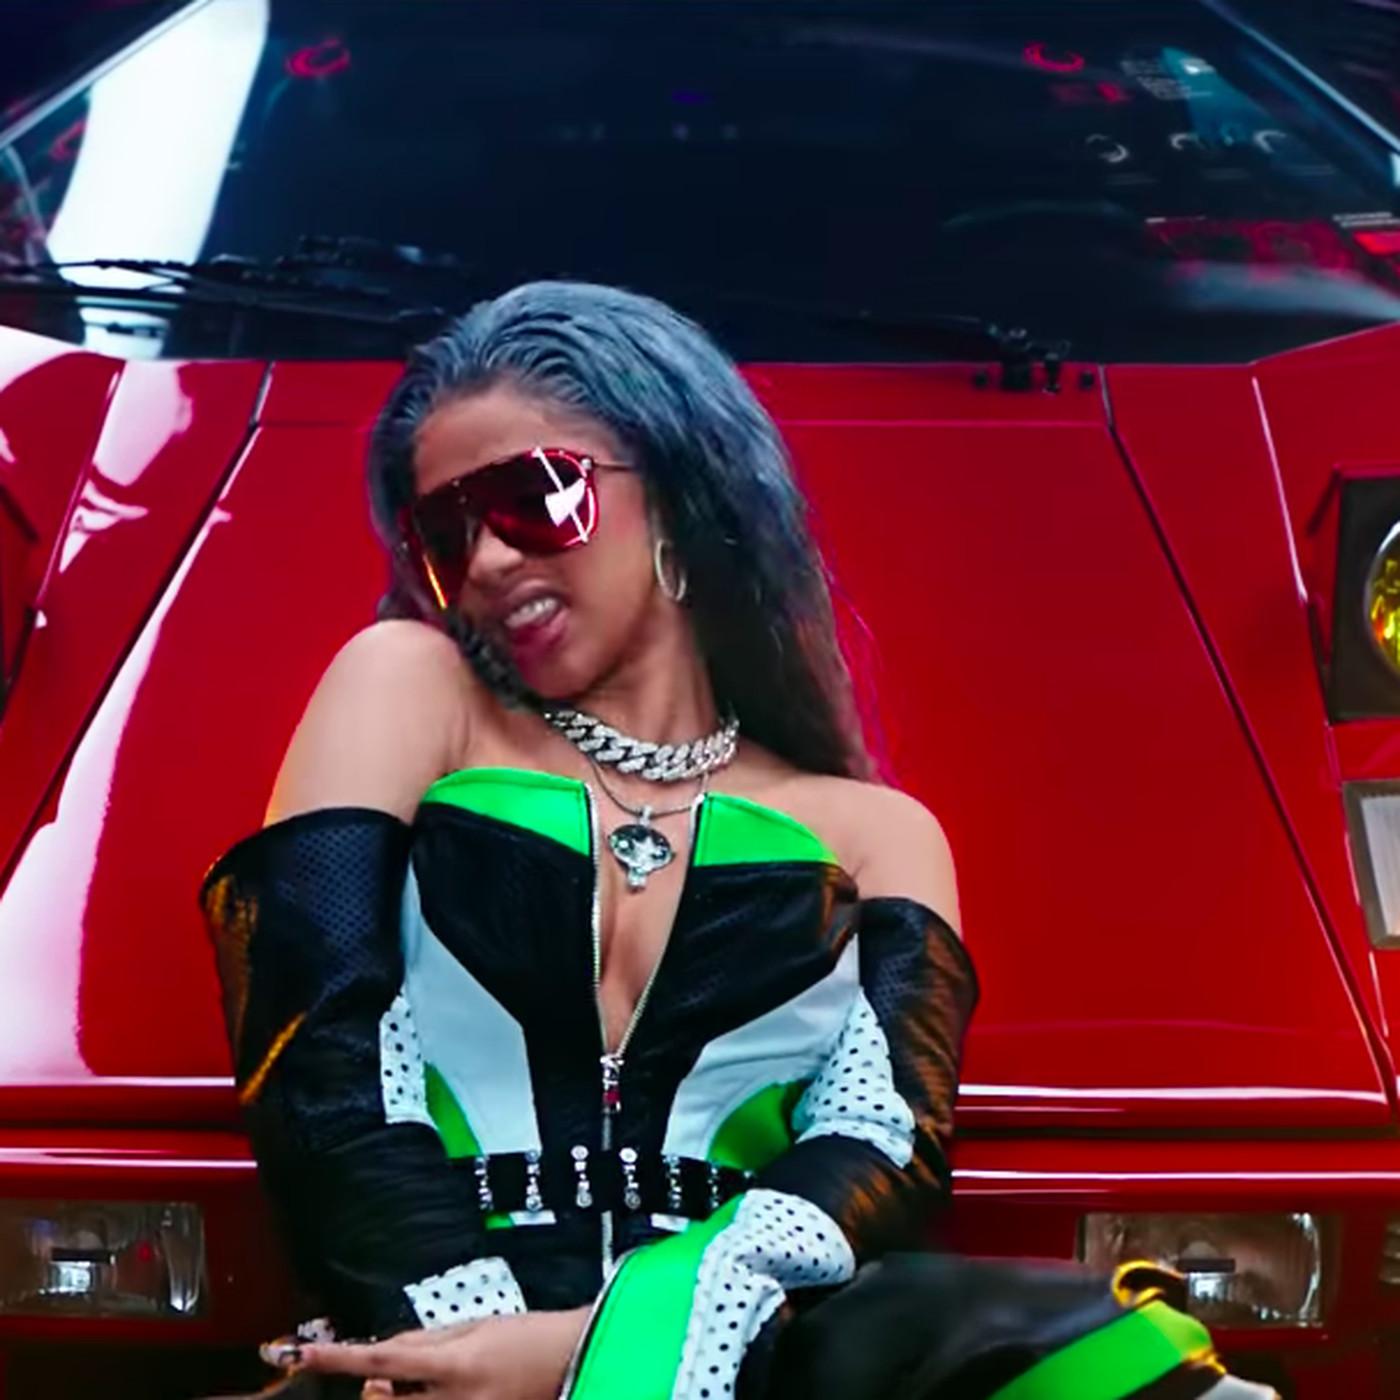 Cardi B Motorsport >> The Video For Motorsport Has Nicki Minaj Cardi B And Flying Lyfts